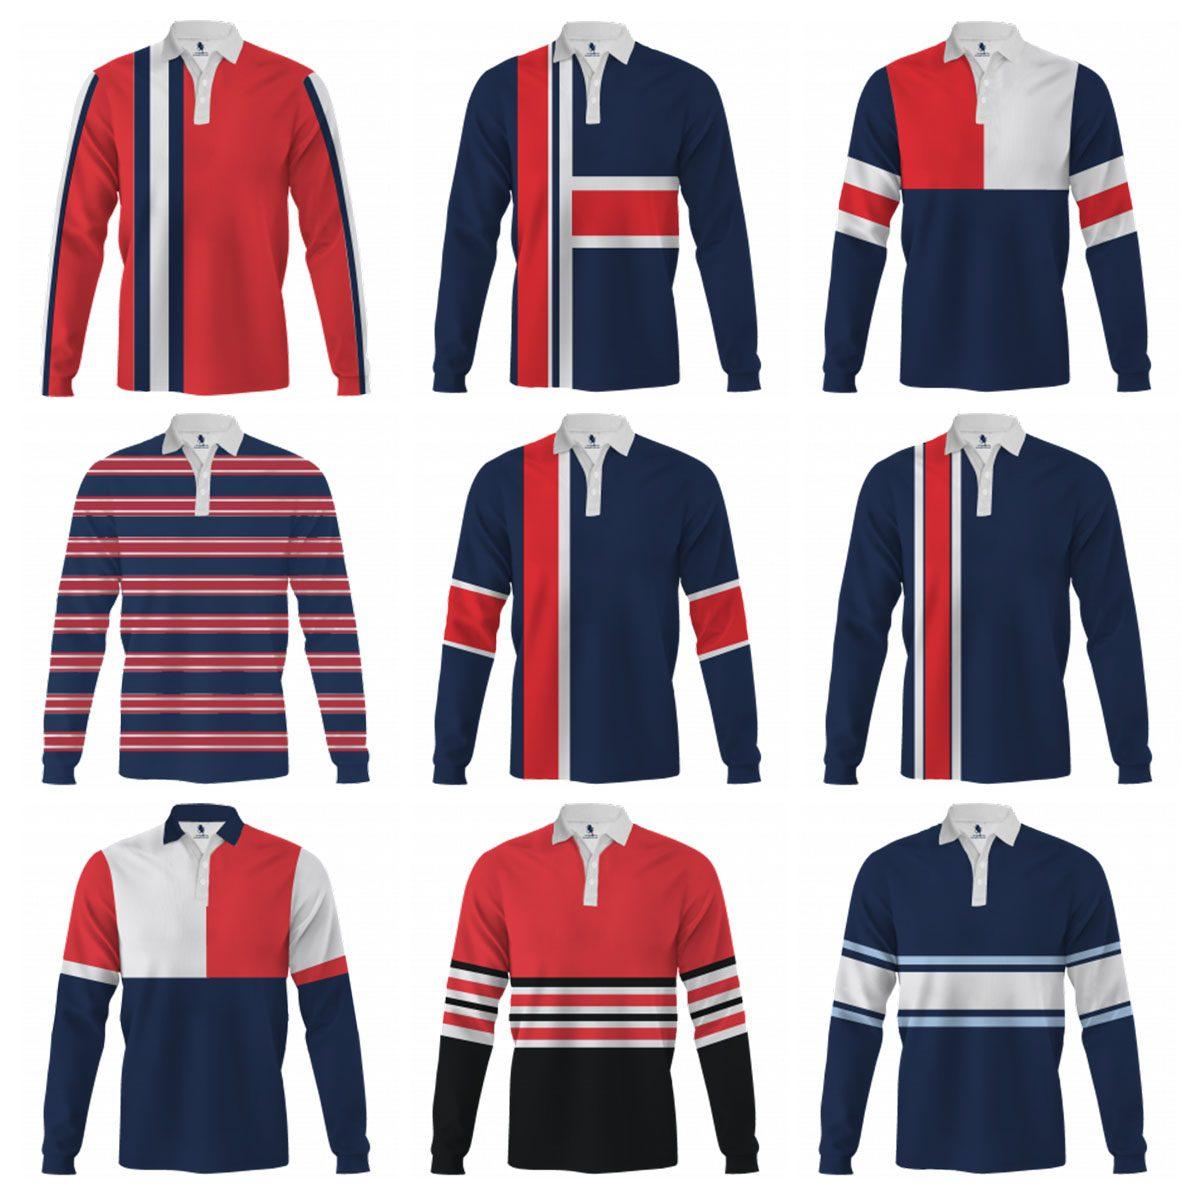 School Leavers - Knitted Jumpers - designs